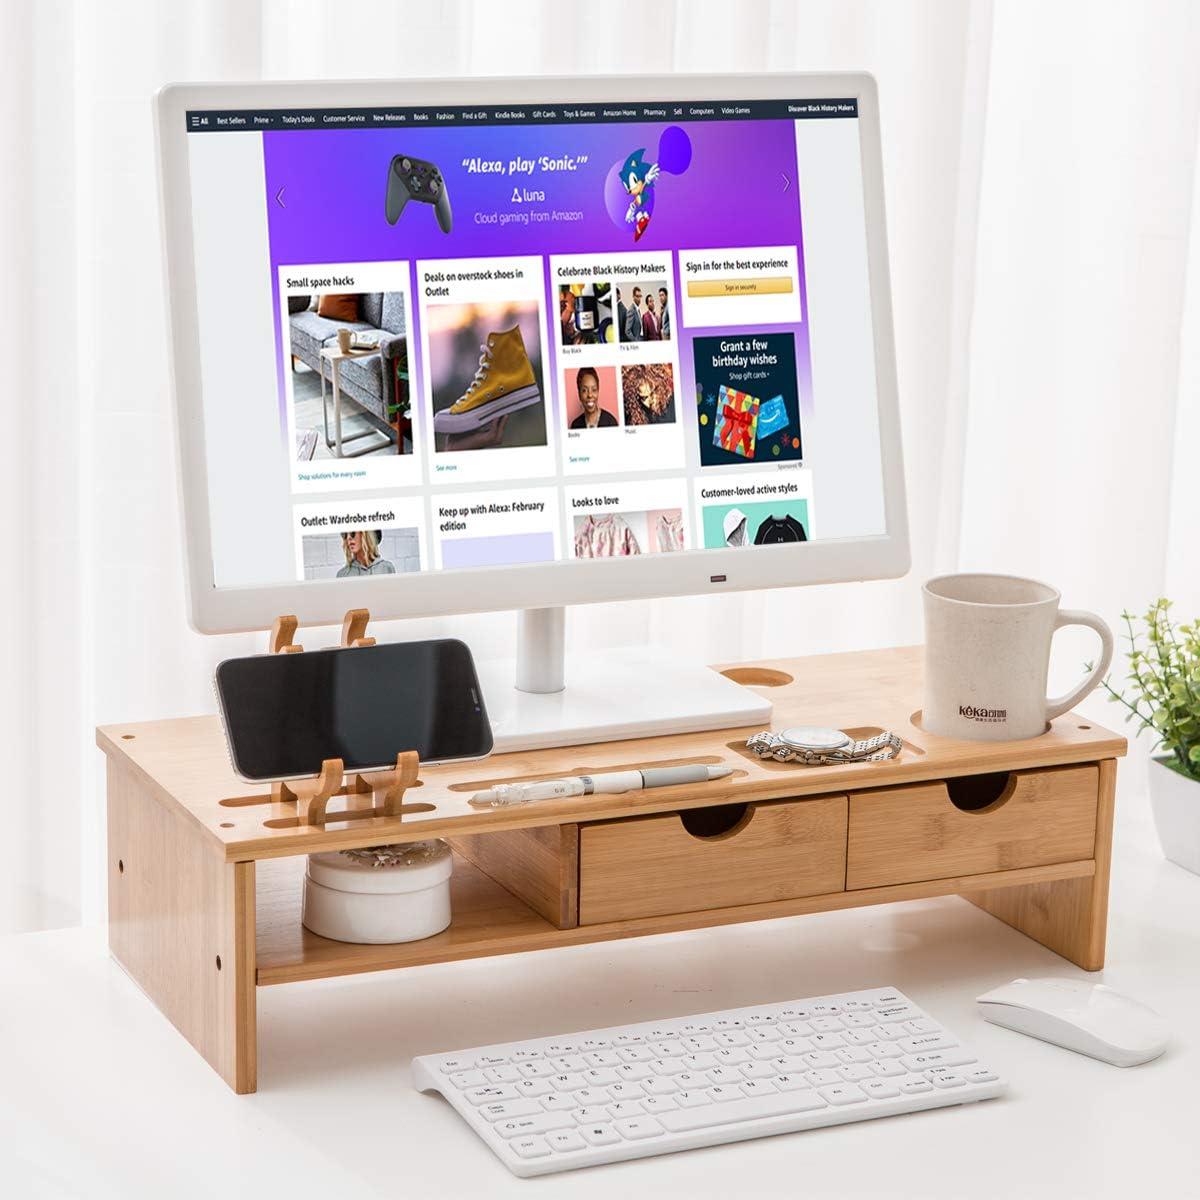 Maydear Bamboo Monitor Stand Riser with 4 Storage Drawer, 2 Tier Desk Organizer Stand for Laptop Computer, Desktop Printer Stand, Versatile as Storage Shelf & Screen Holder (21.25